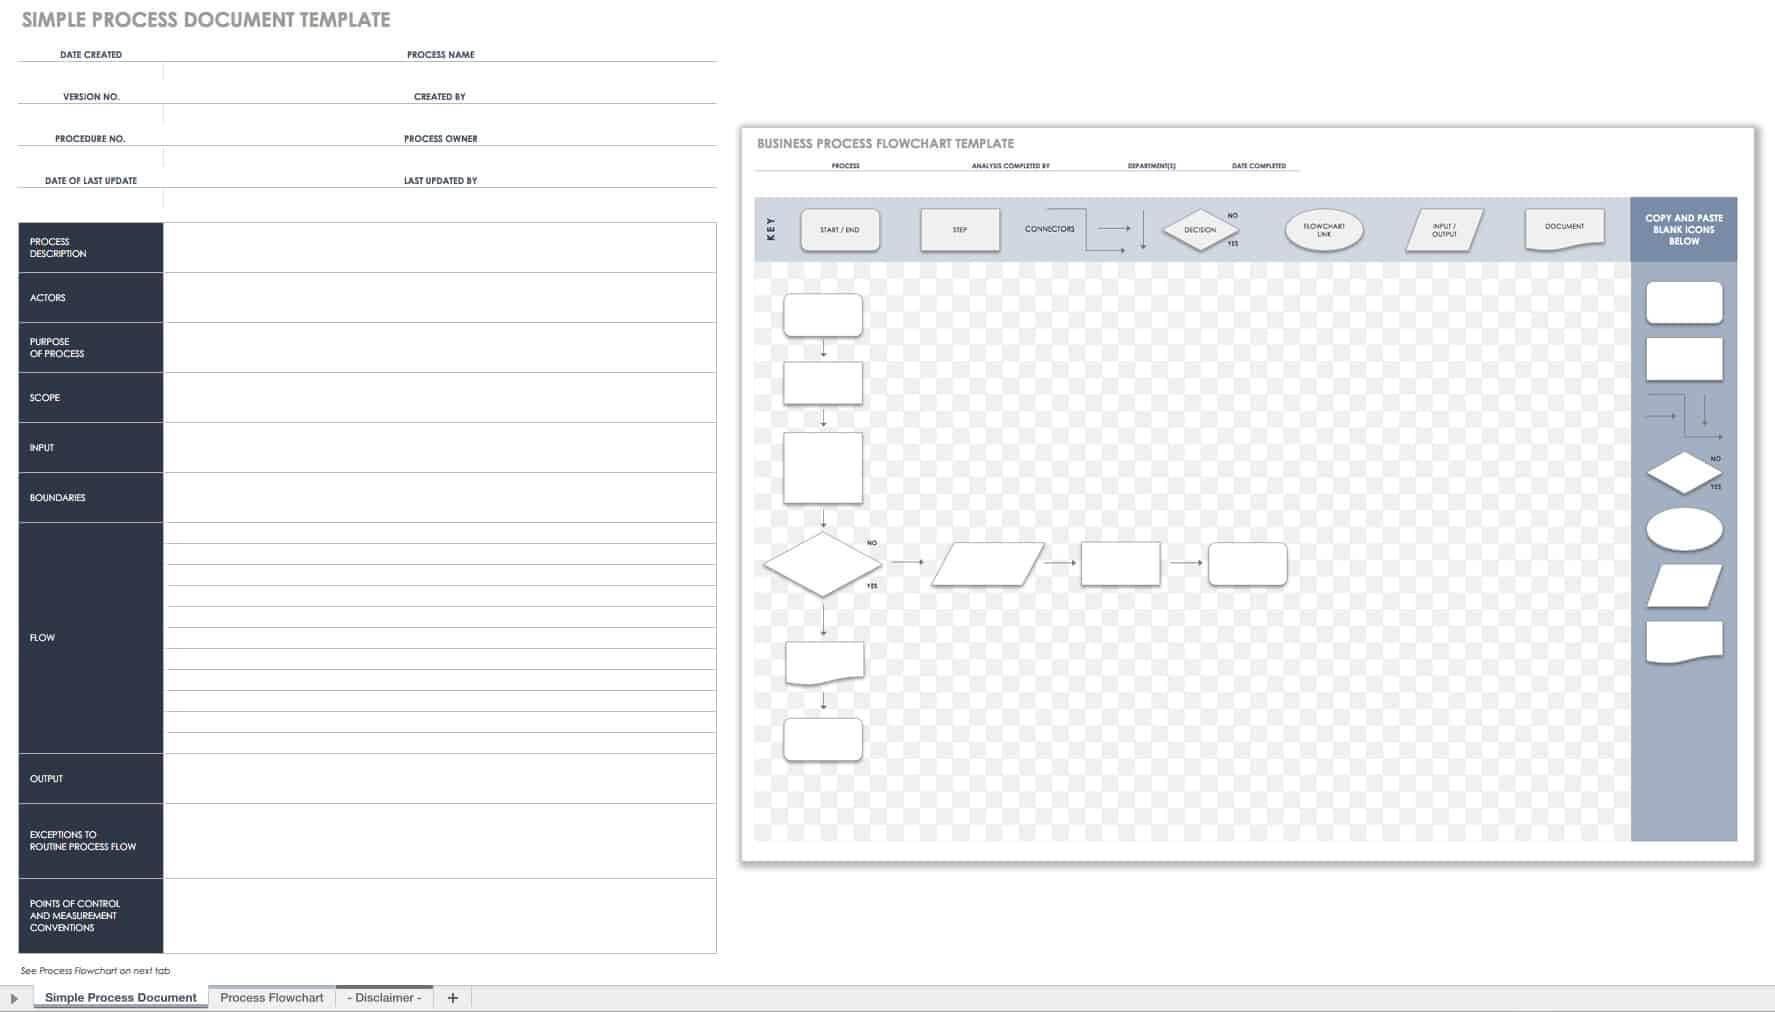 Free Process Document Templates | Smartsheet Within Business Process Documentation Template